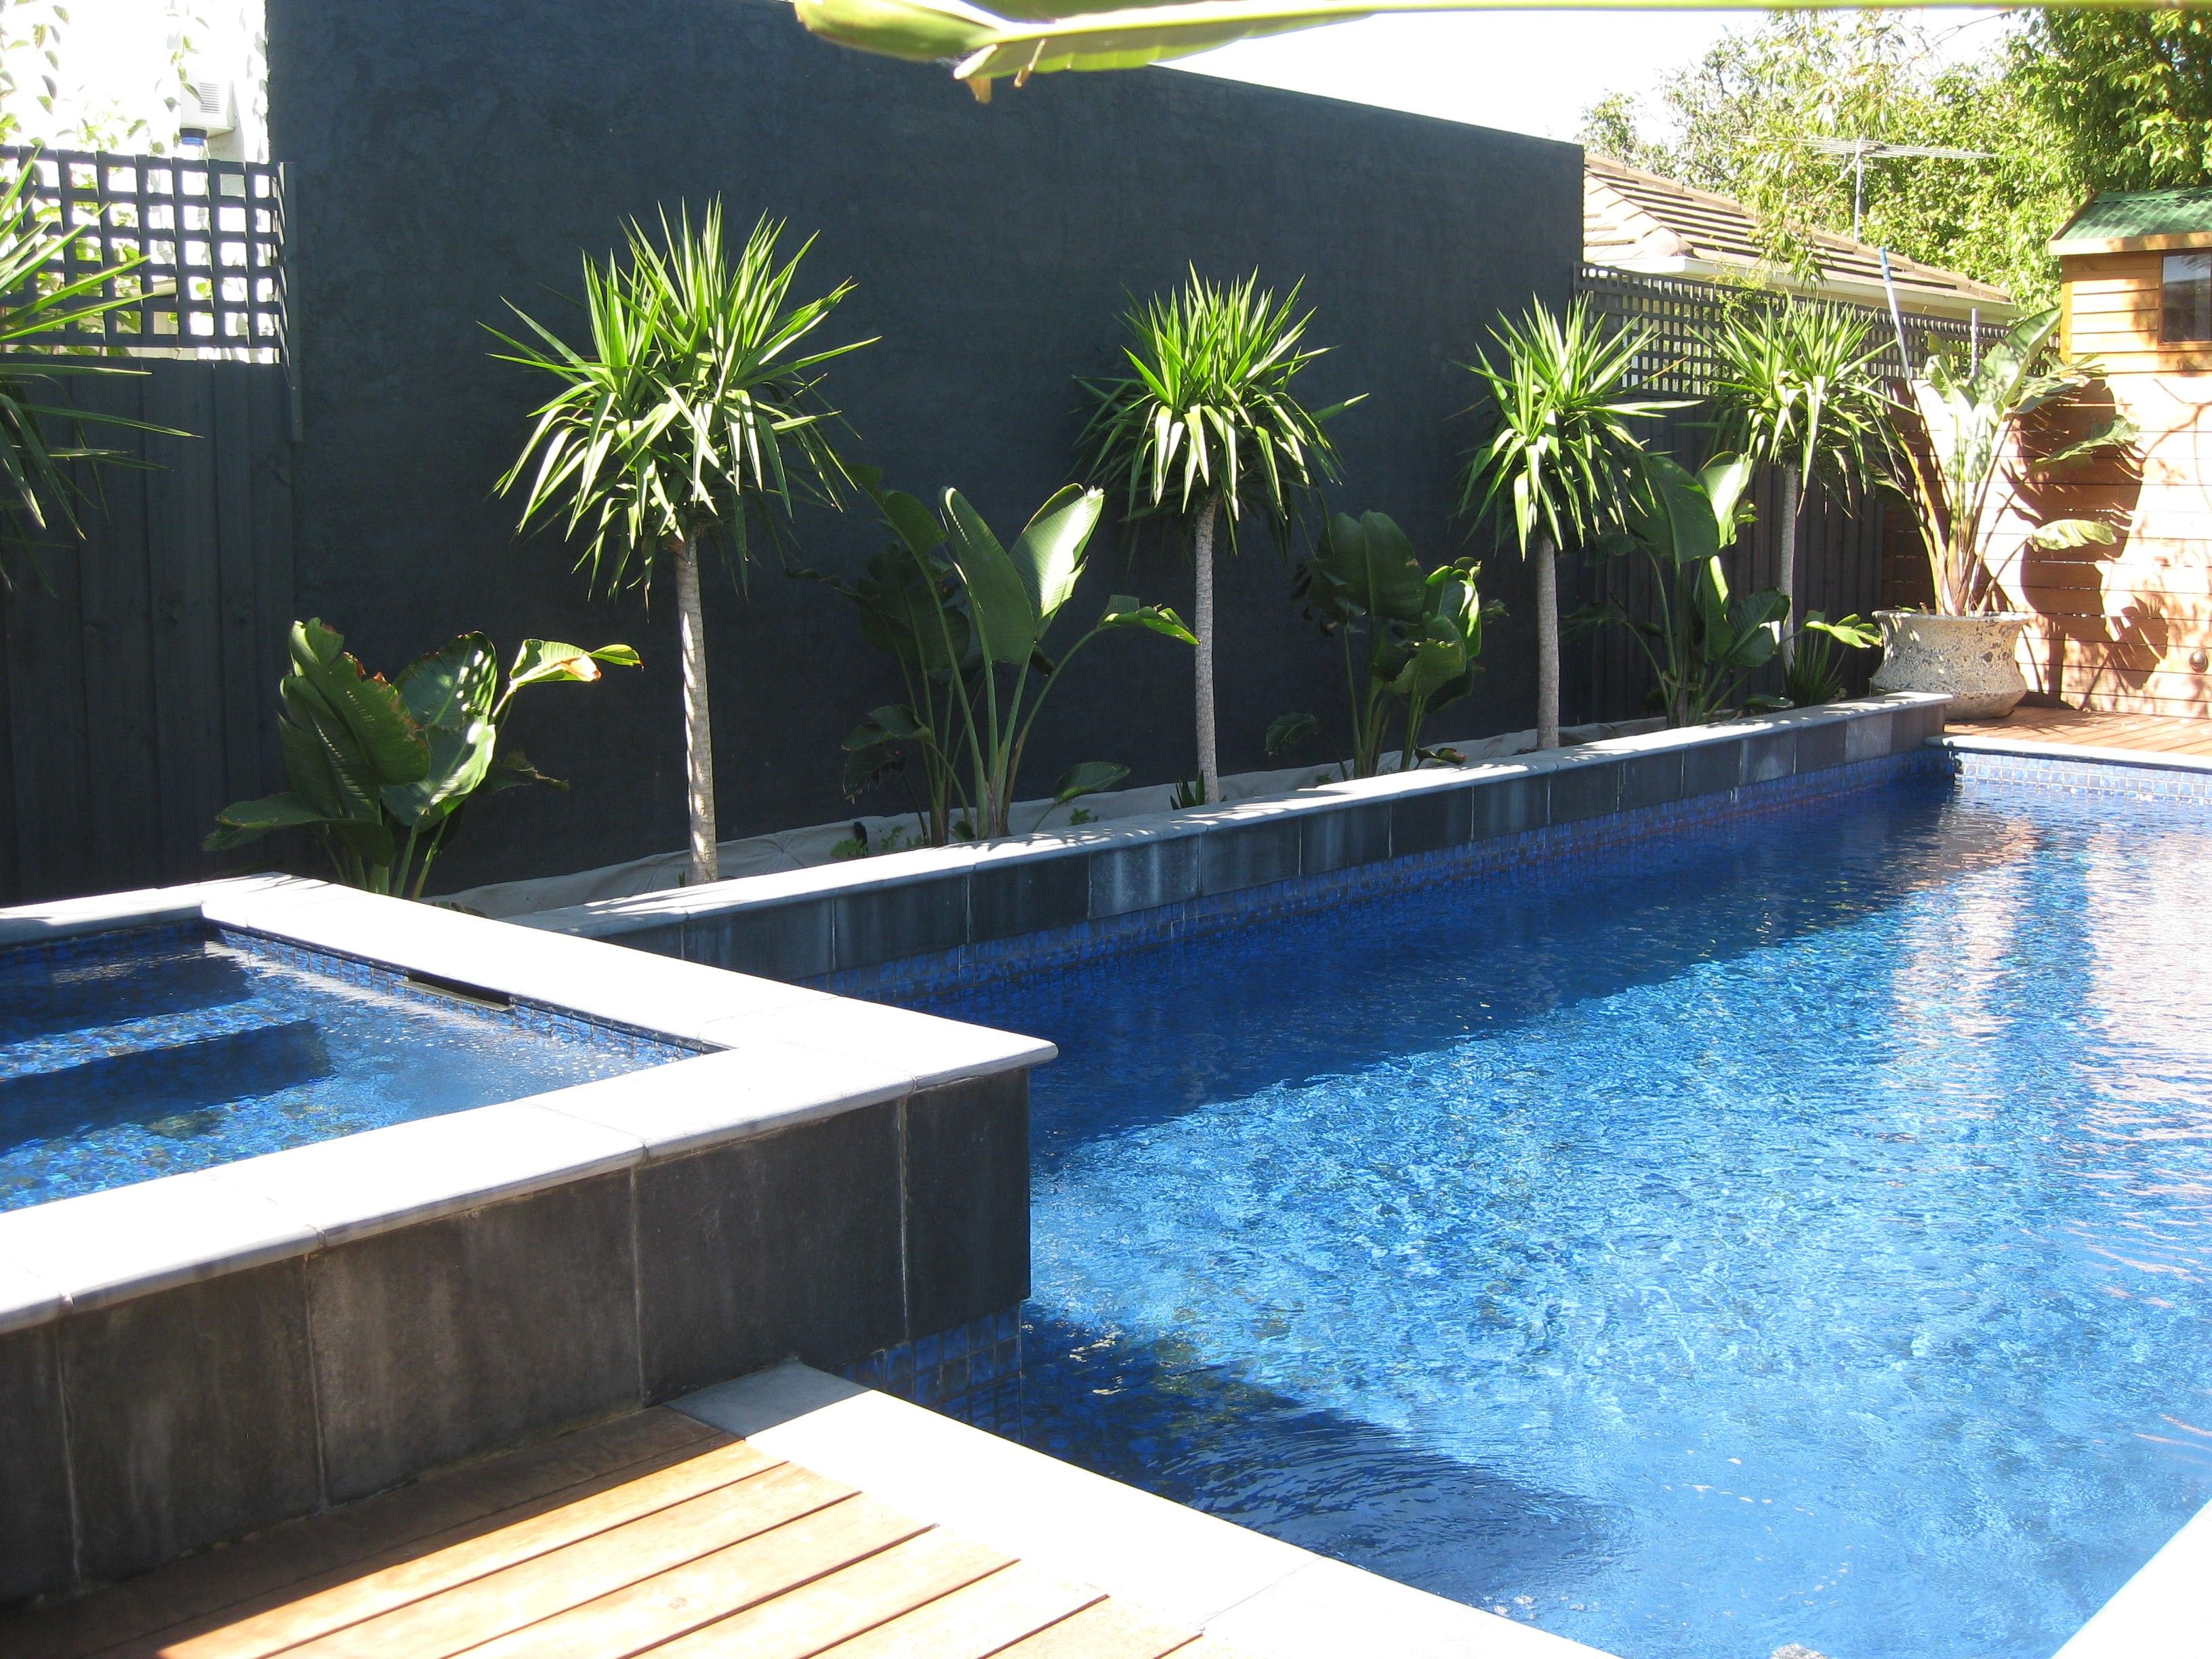 For Pool Garden Design Landscaping And Gardening From Modern Landscape Swimming Ideas Sourcerol Modern Landscaping Modern Landscape Design Modern Garden Design